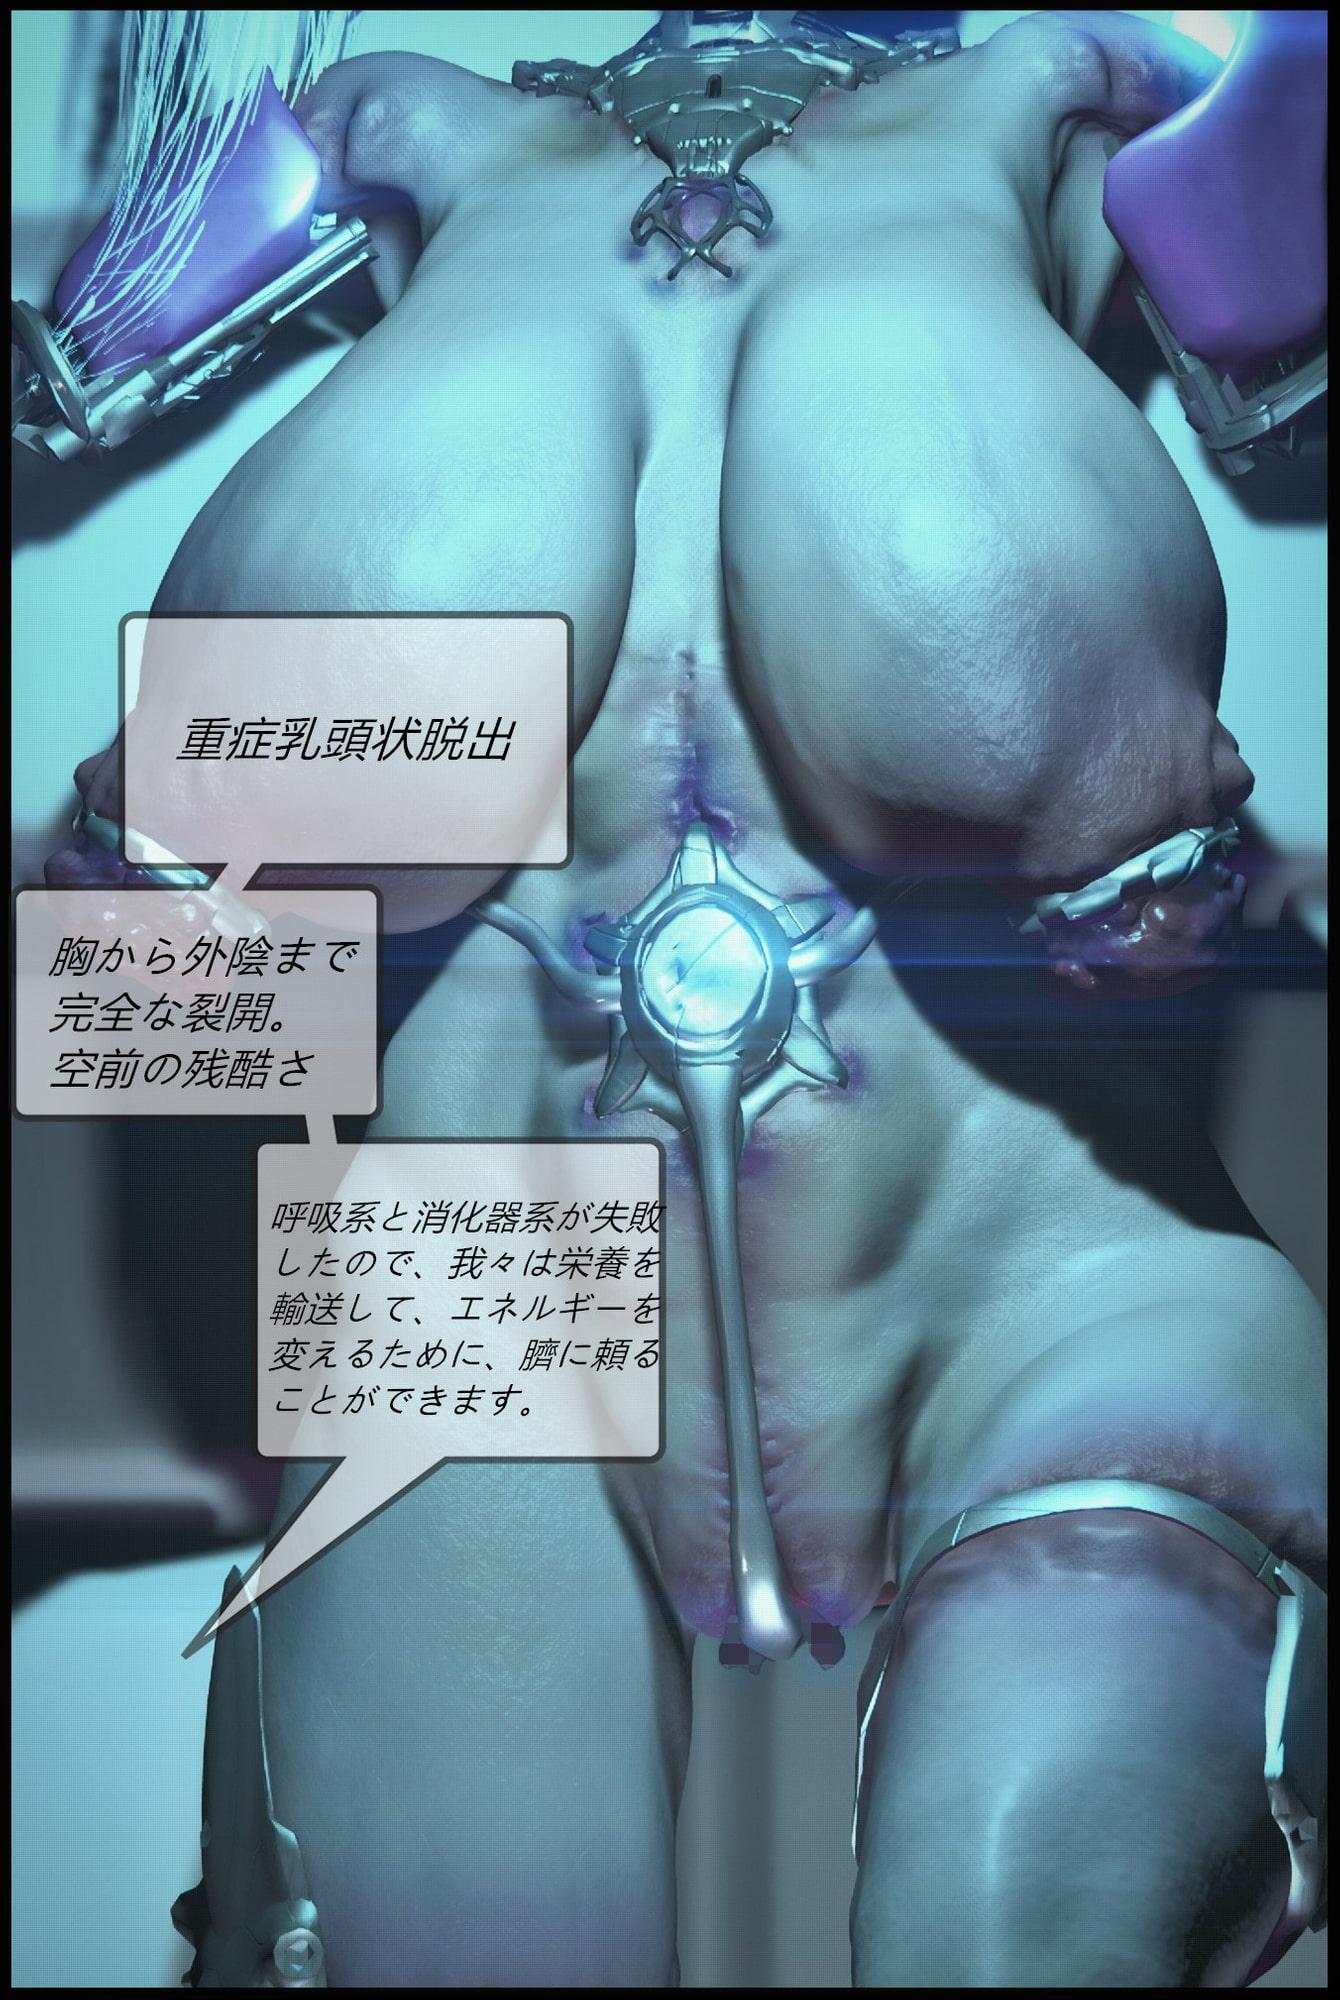 REBIRTH 生き返る(CHAPTER1)日本語版